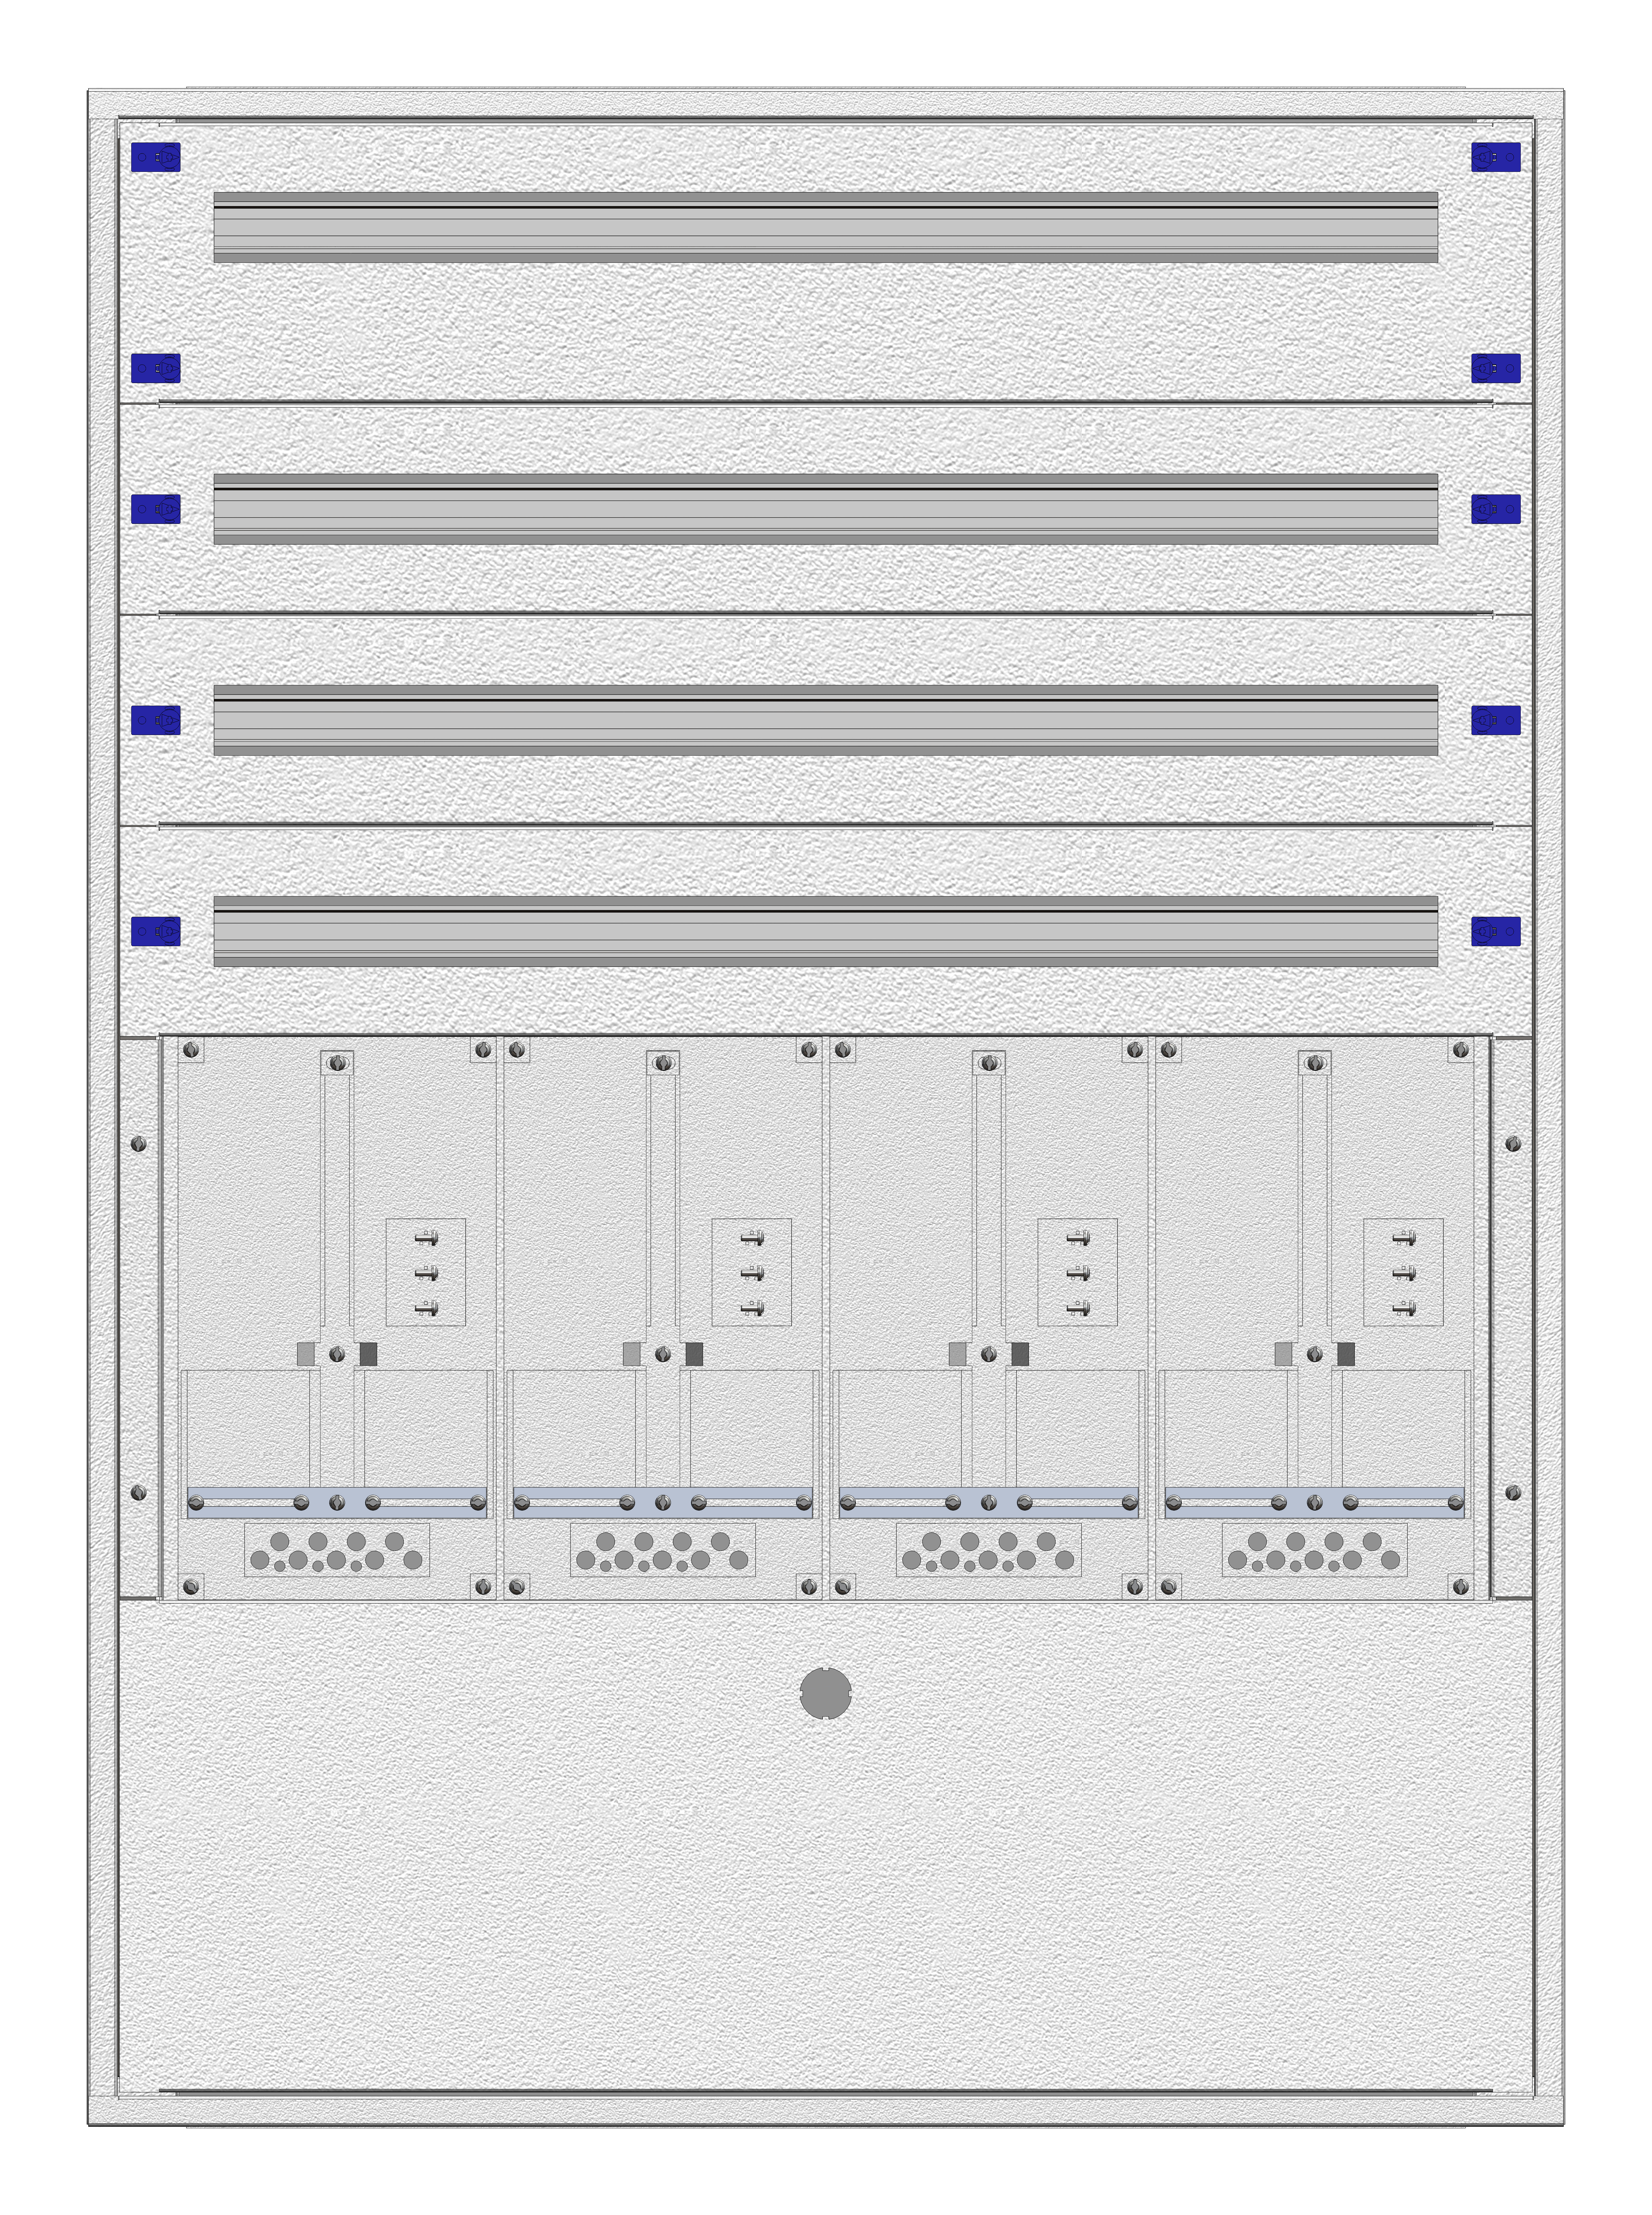 1 Stk Aufputz-Zählerverteiler 4A-28E/NOE 4ZP, H1380B1030T250mm IL160428NS